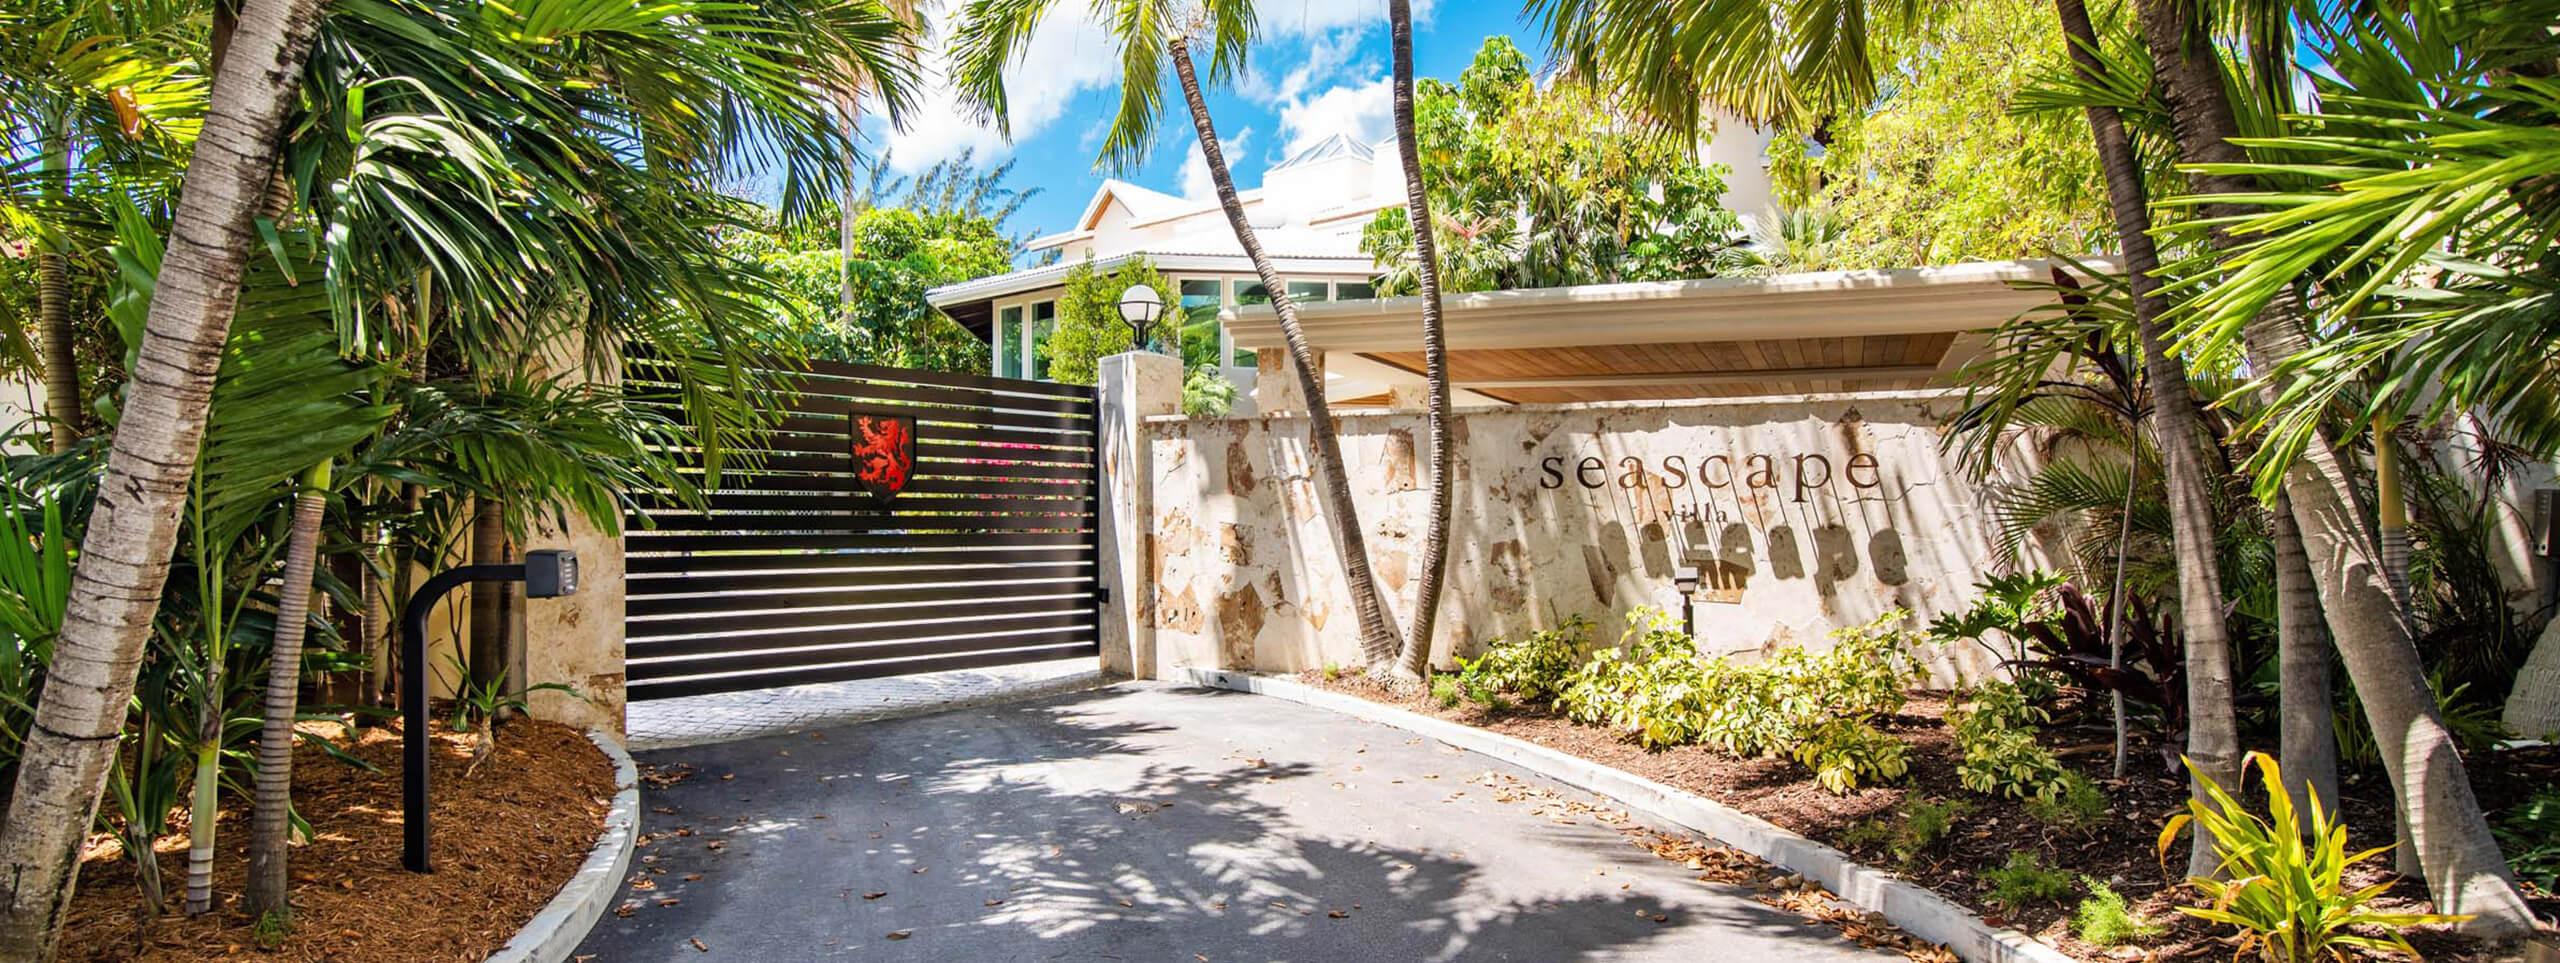 Seascape Villa Cayman Islands Caribbean Beach Vacation and Quarantine Rental